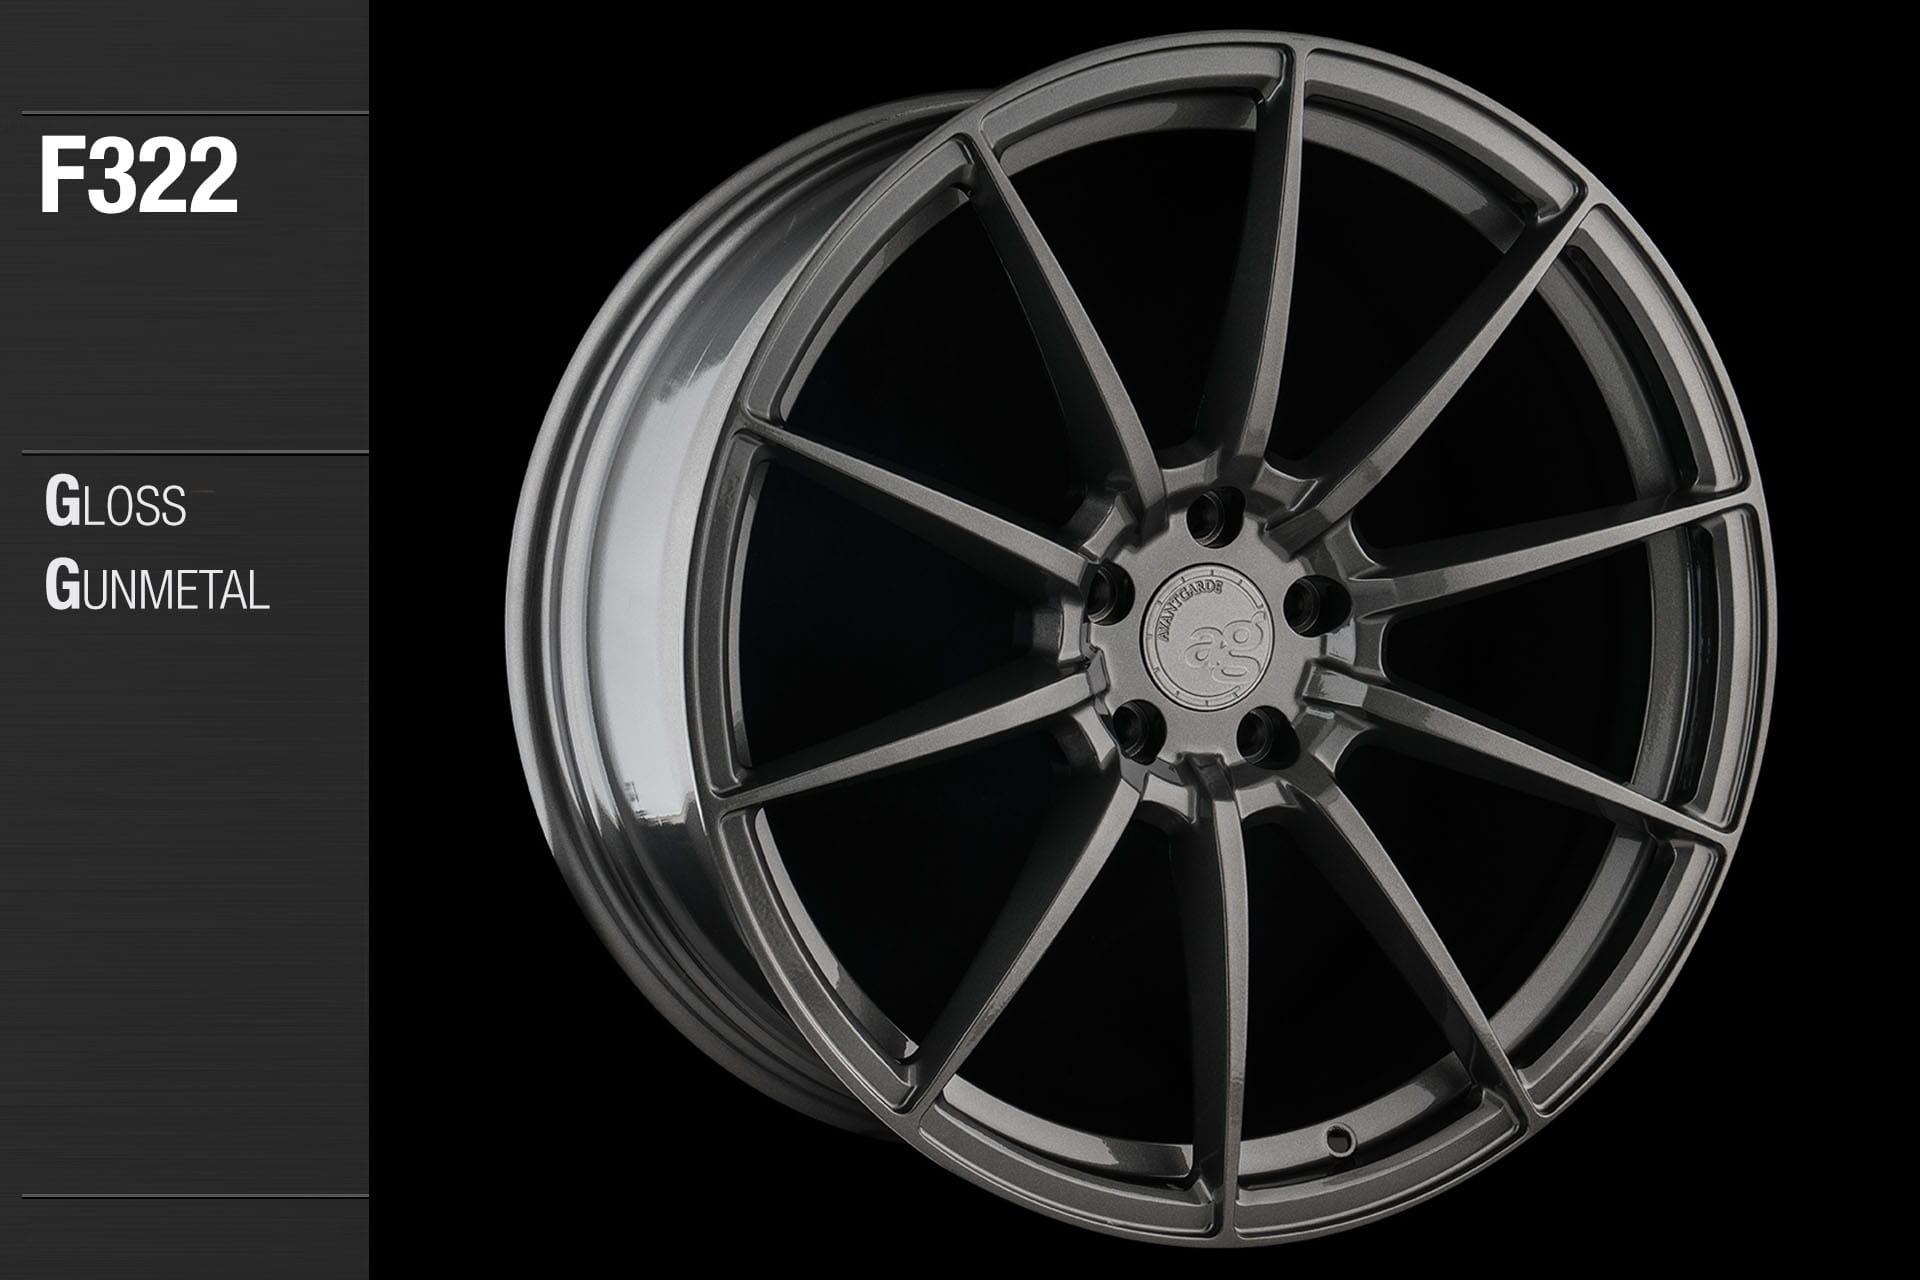 avant-garde-ag-wheels-f322-gloss-gunmetal-4-min